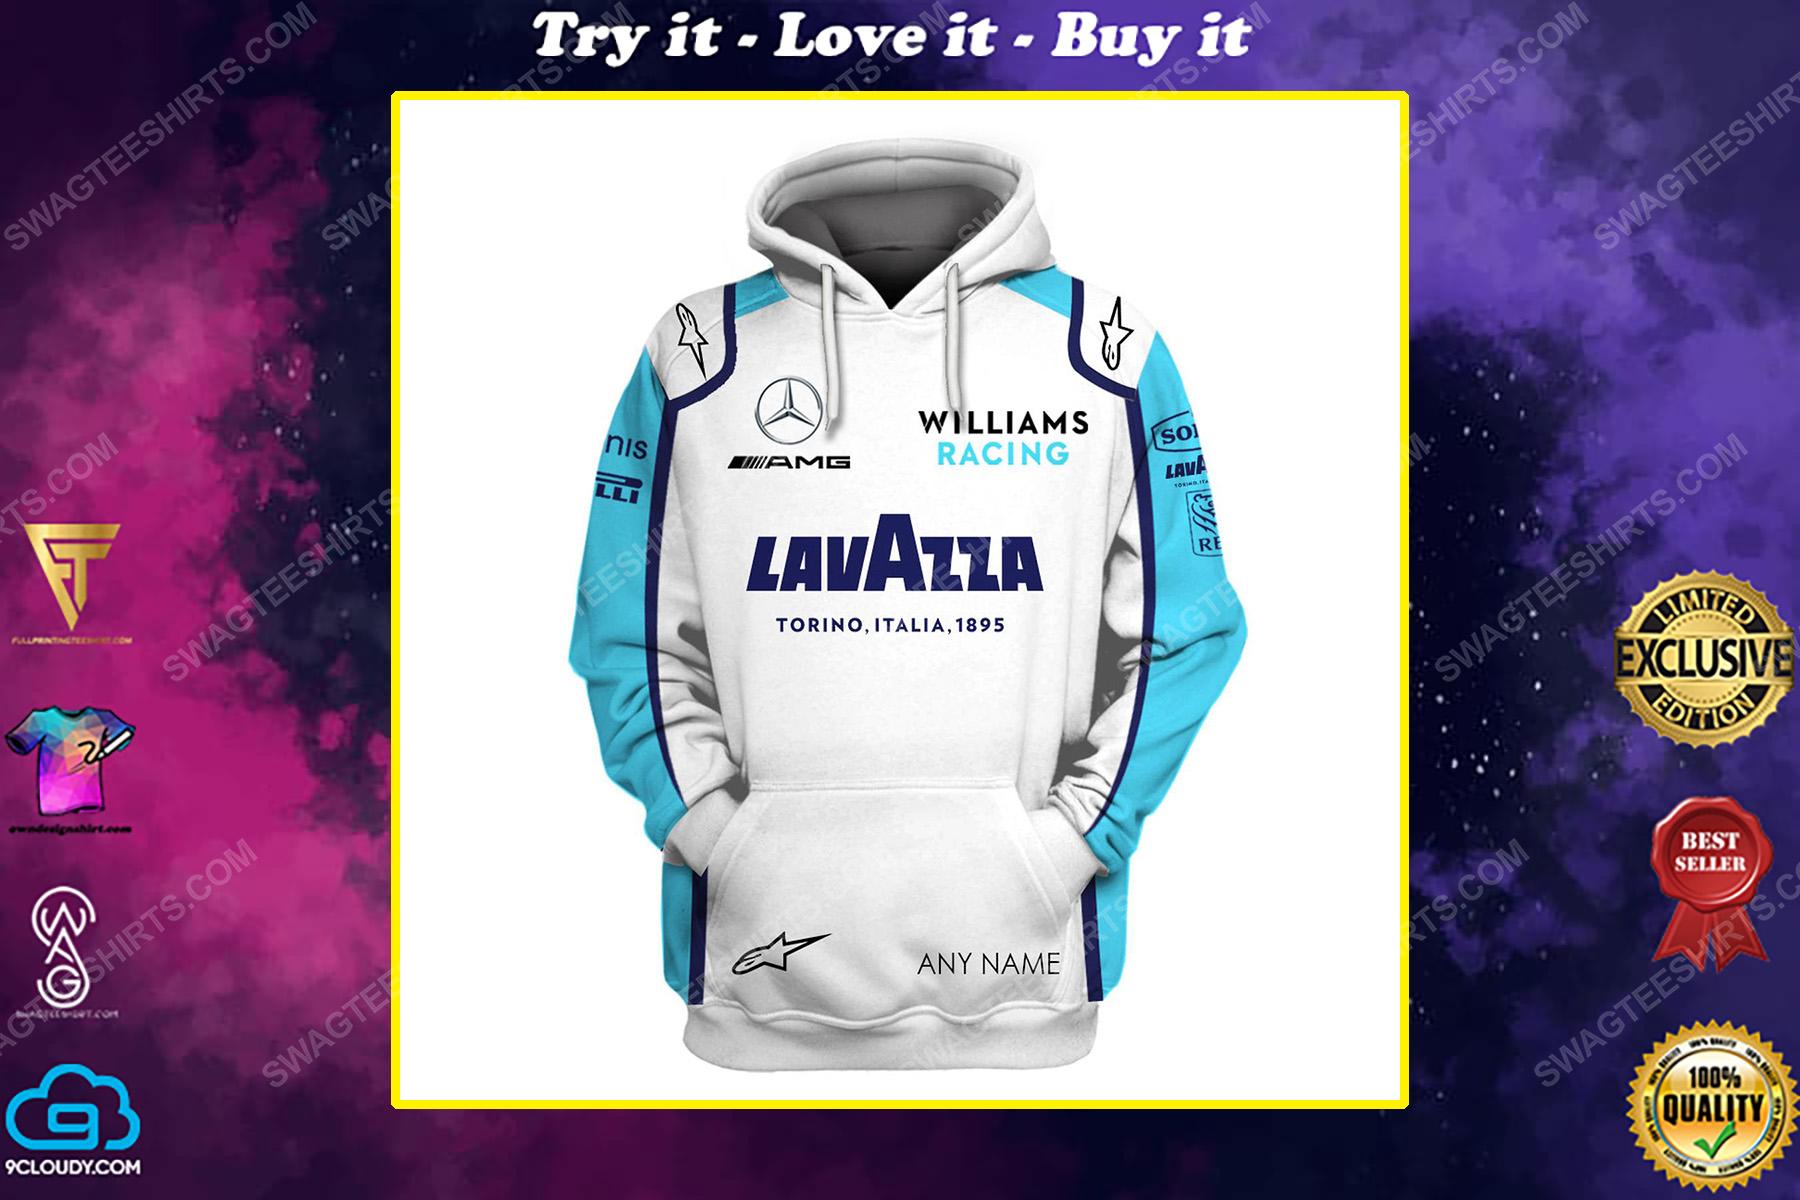 Custom lavazza mercedes racing team motorsport full printing shirt